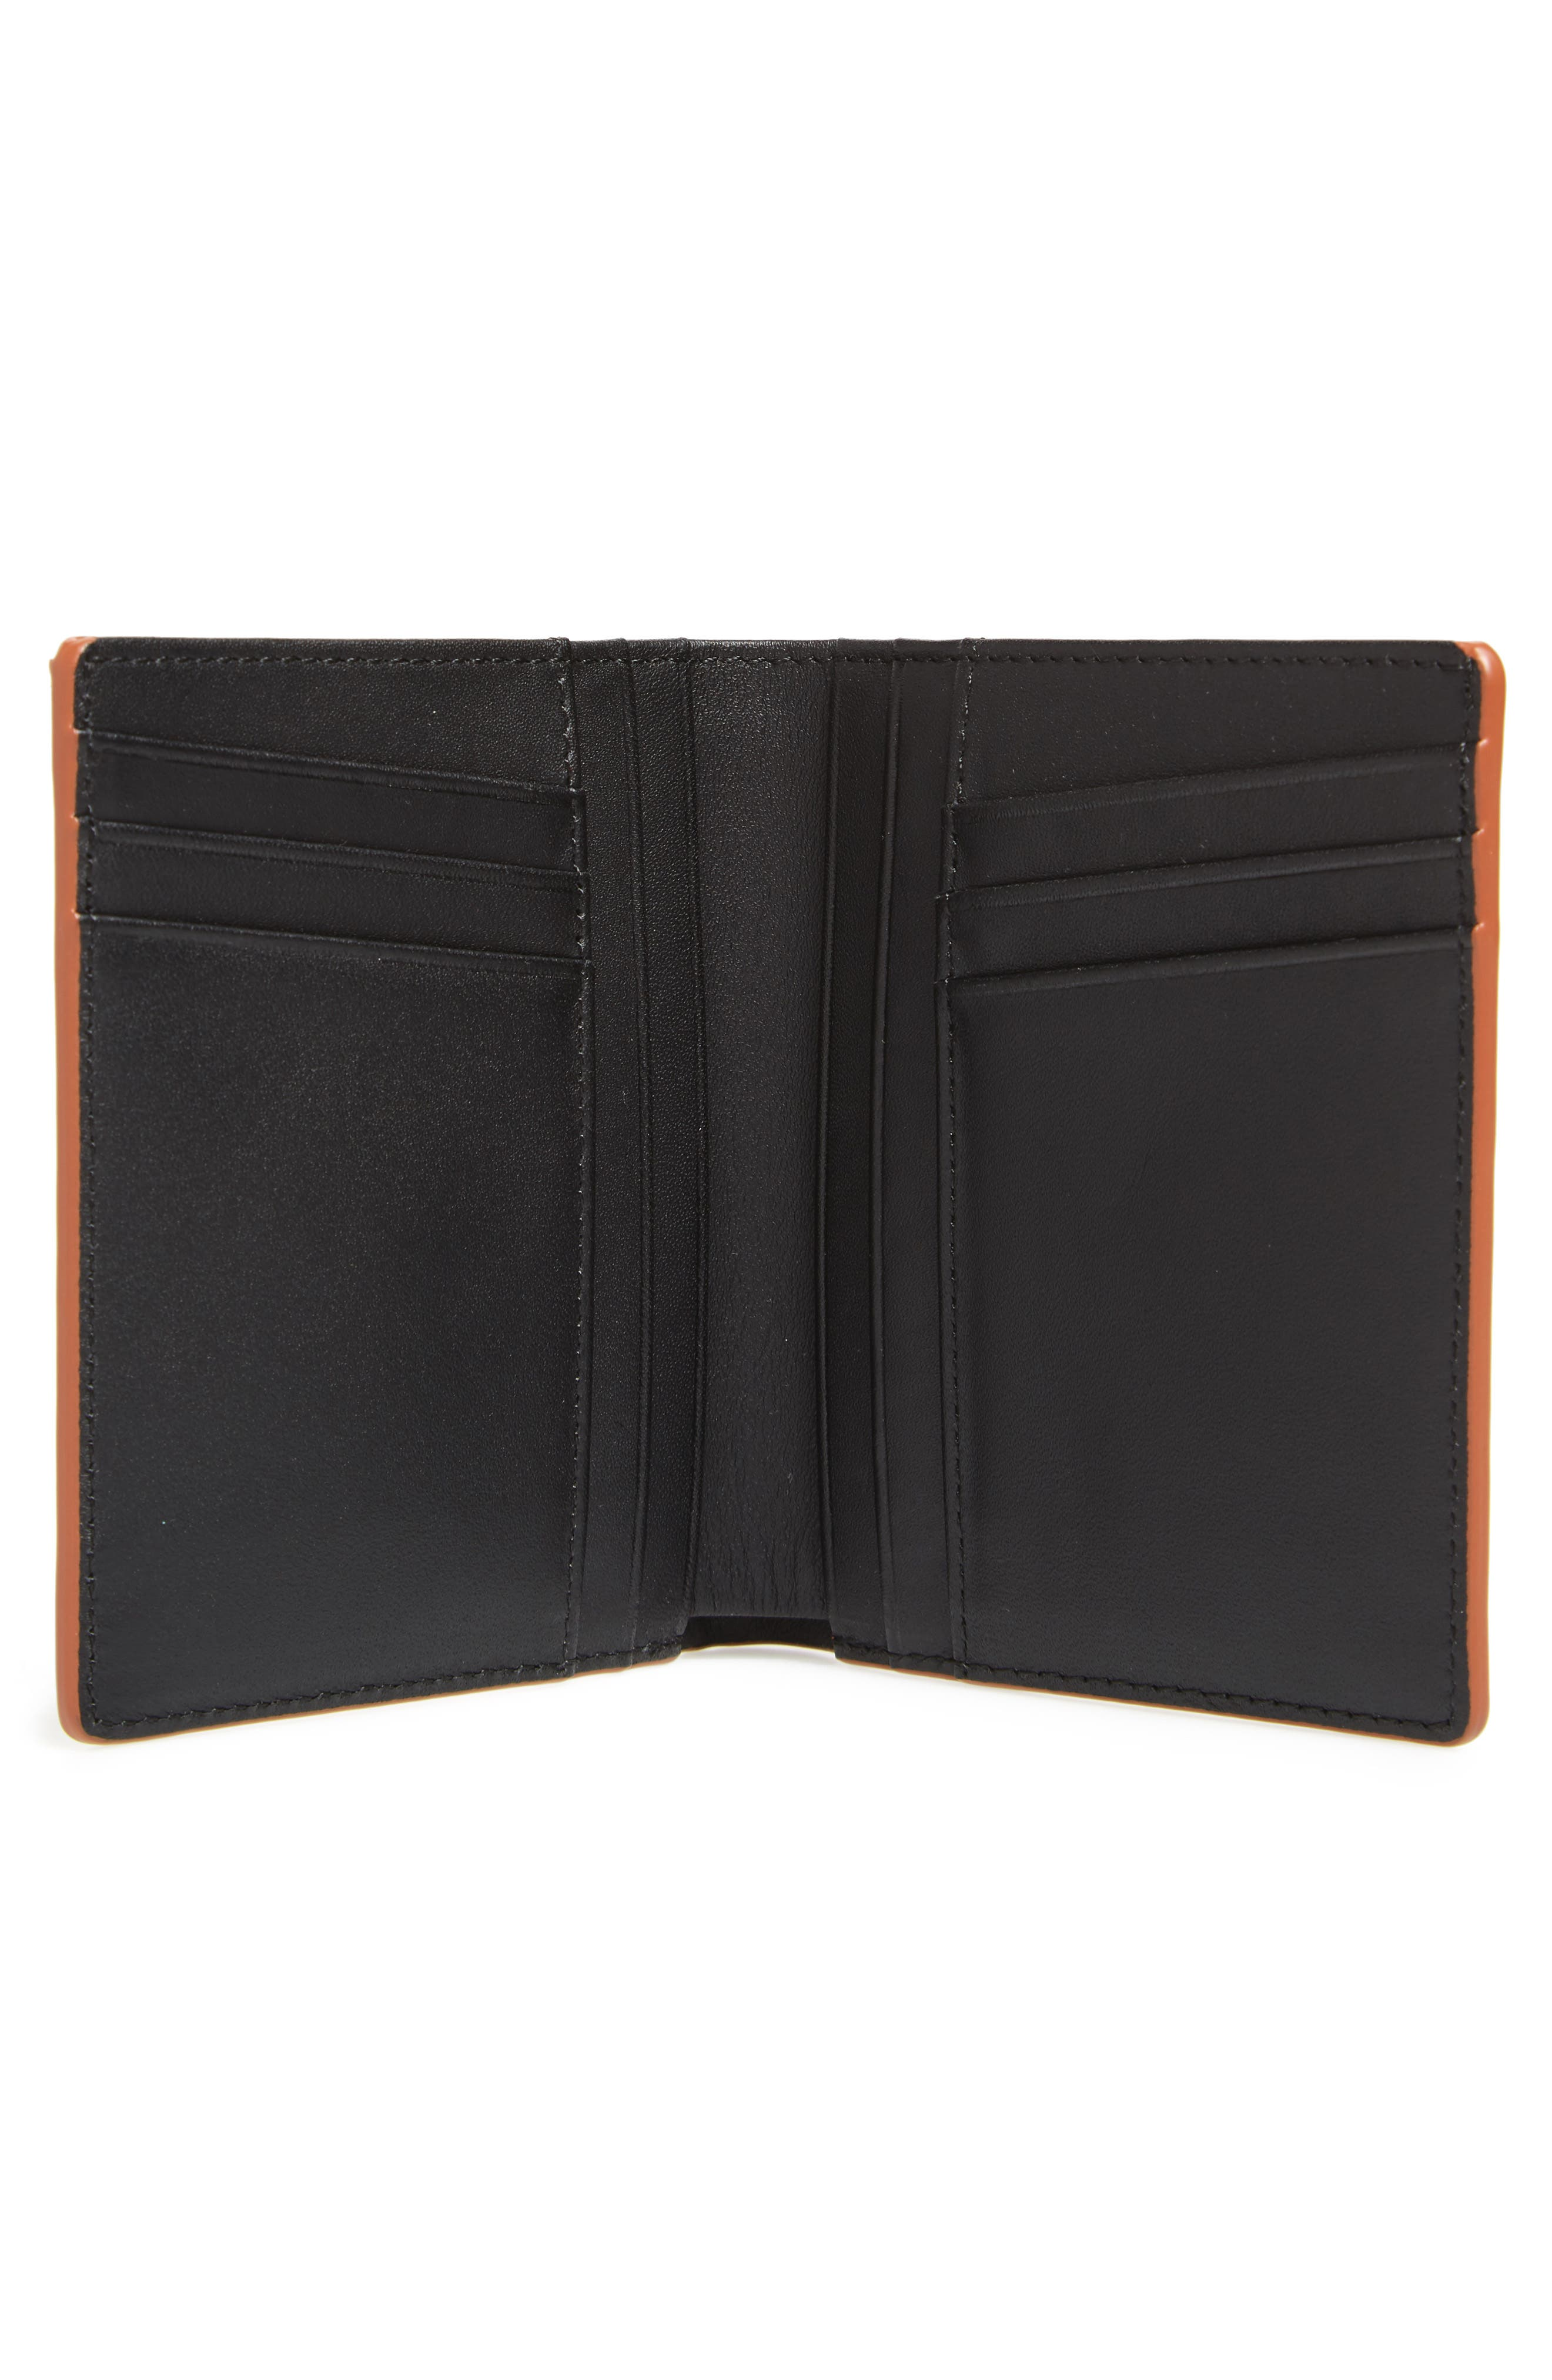 Alternate Image 2  - WANT LES ESSENTIELS Bradley Bifold Leather Wallet